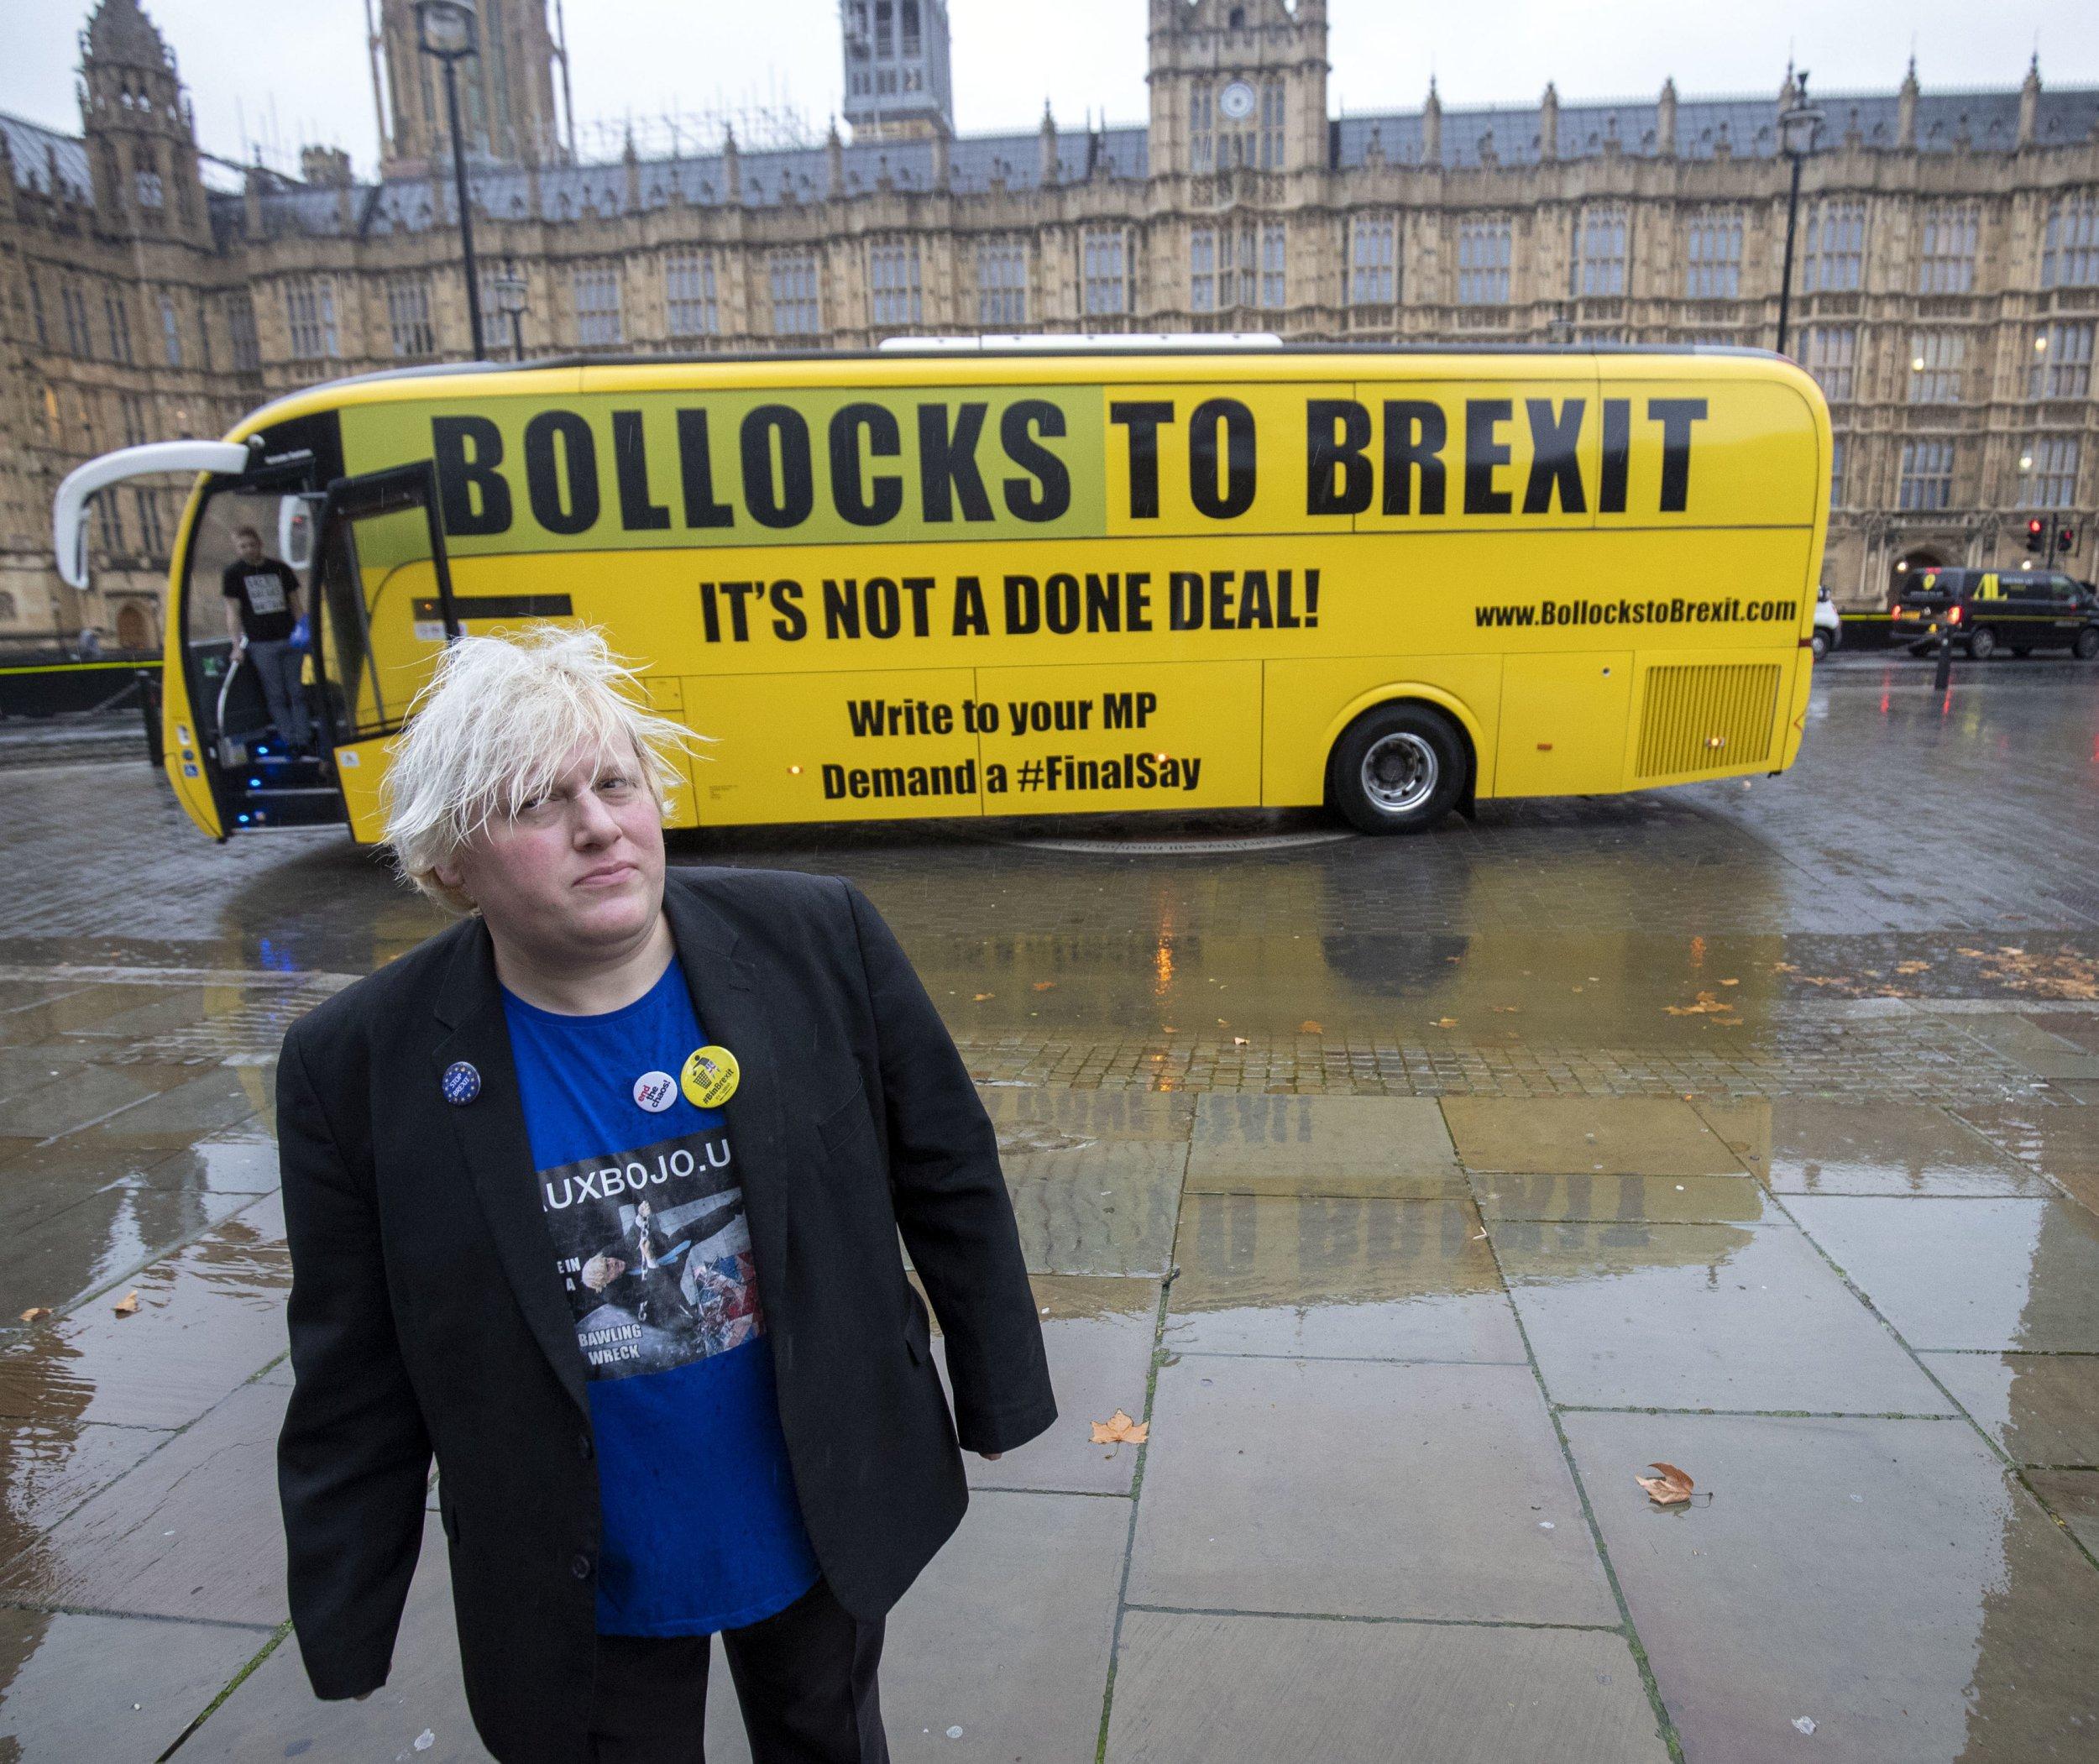 Bollocks to Brexit' bus demand...